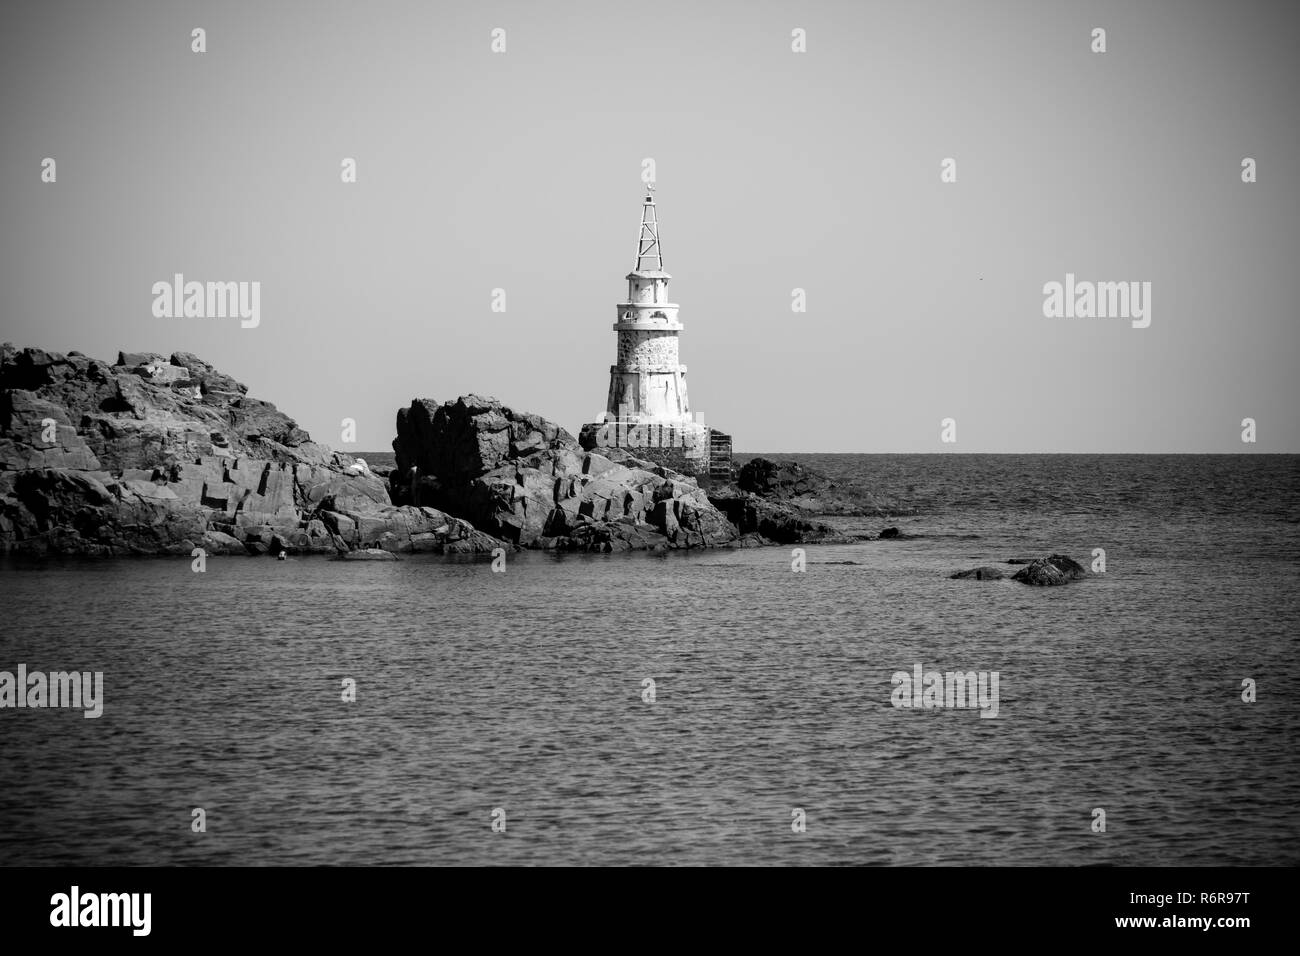 A lighthouse on the rocks. Black Sea. Ahtopol. Bulgaria. Black and white. - Stock Image